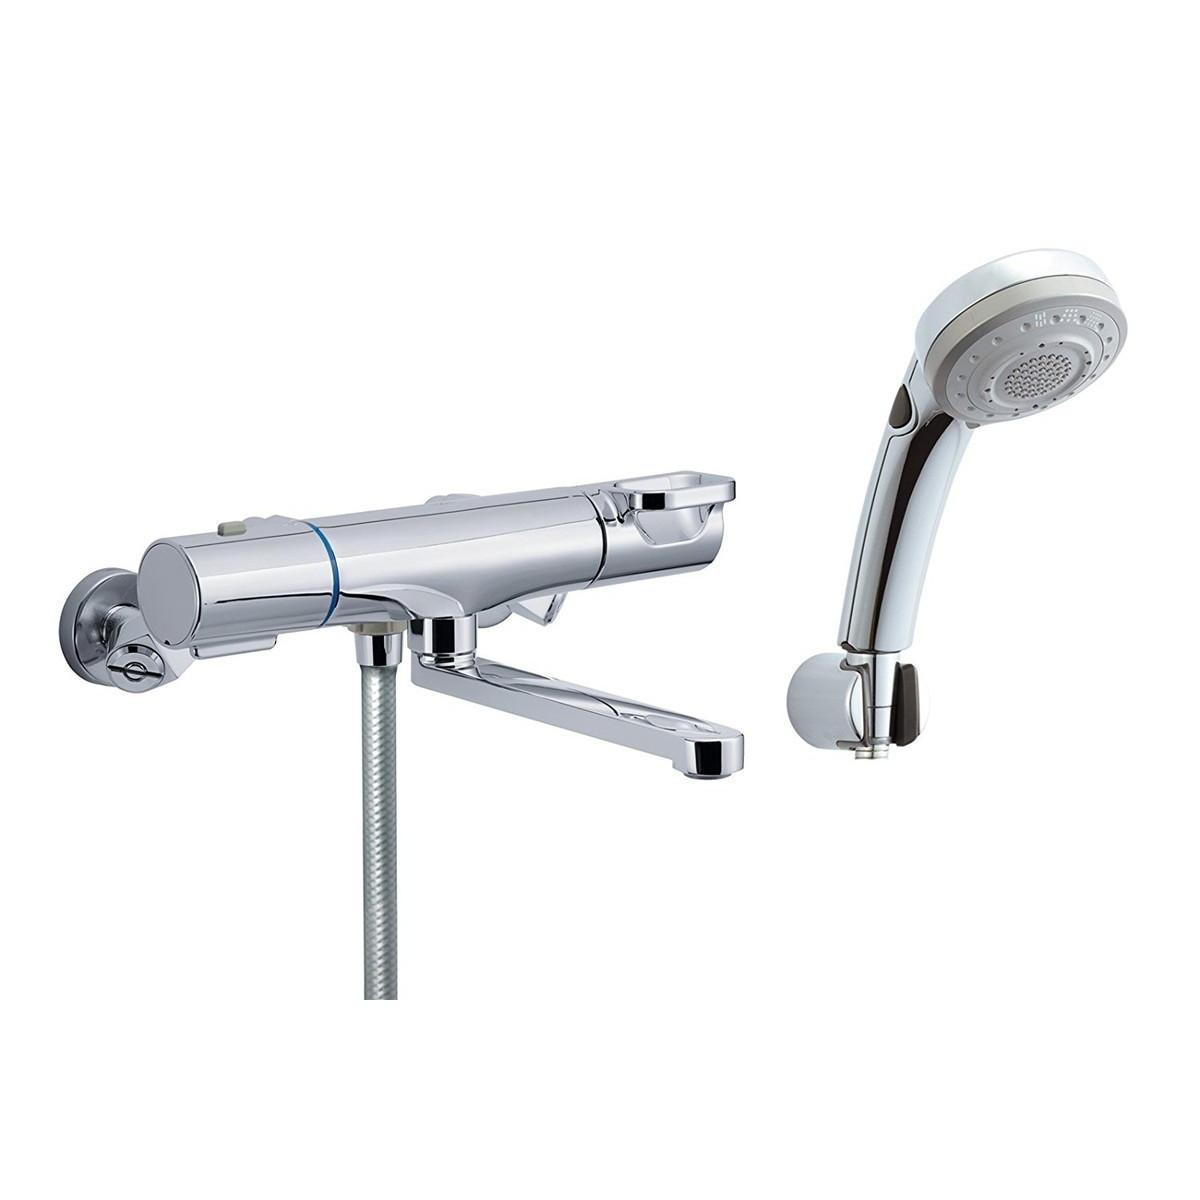 LIXIL(リクシル) INAX 浴室用 サーモスタット付シャワーバス水栓 エコフル多機能スイッチシャワー 凍結防止水抜き仕様 RBF-817NW【クーポン配布中】